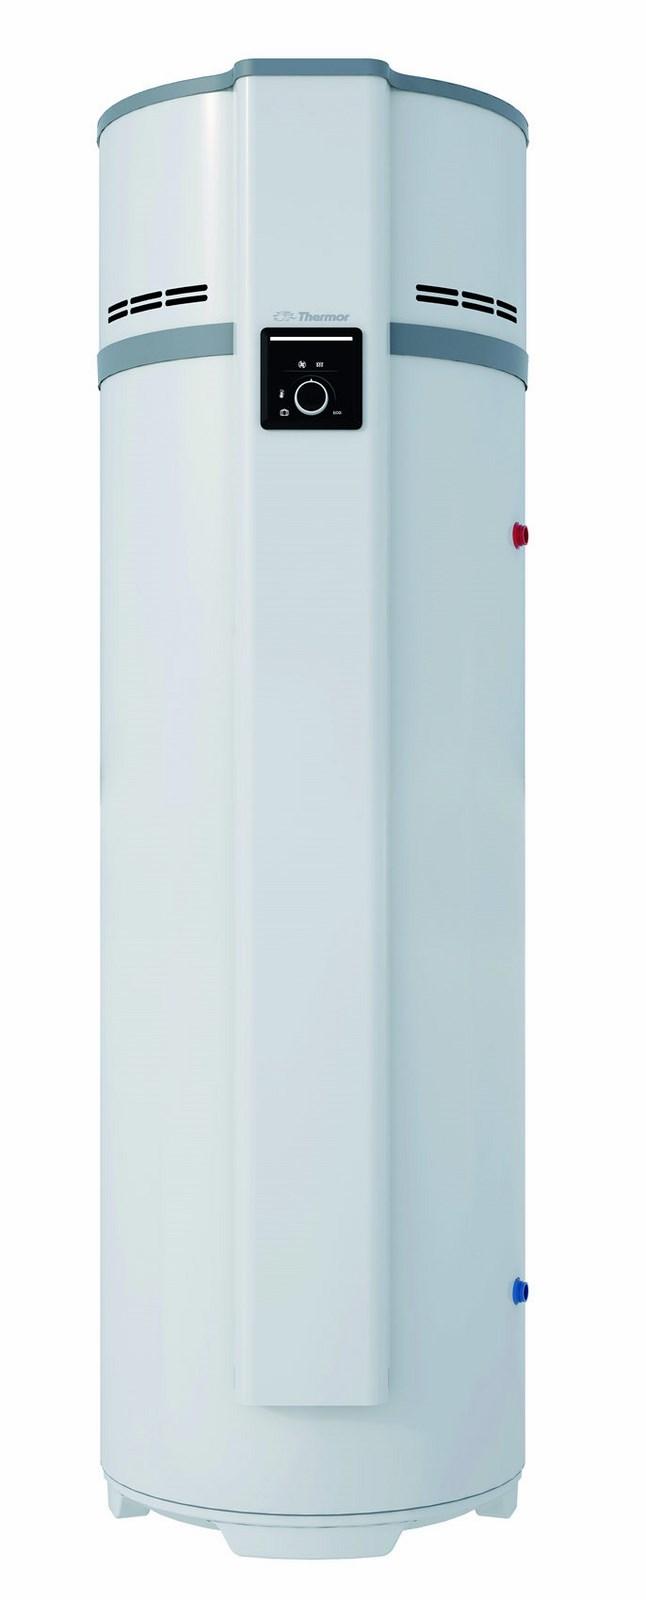 chauffe eau thermodynamique airlis thermor. Black Bedroom Furniture Sets. Home Design Ideas